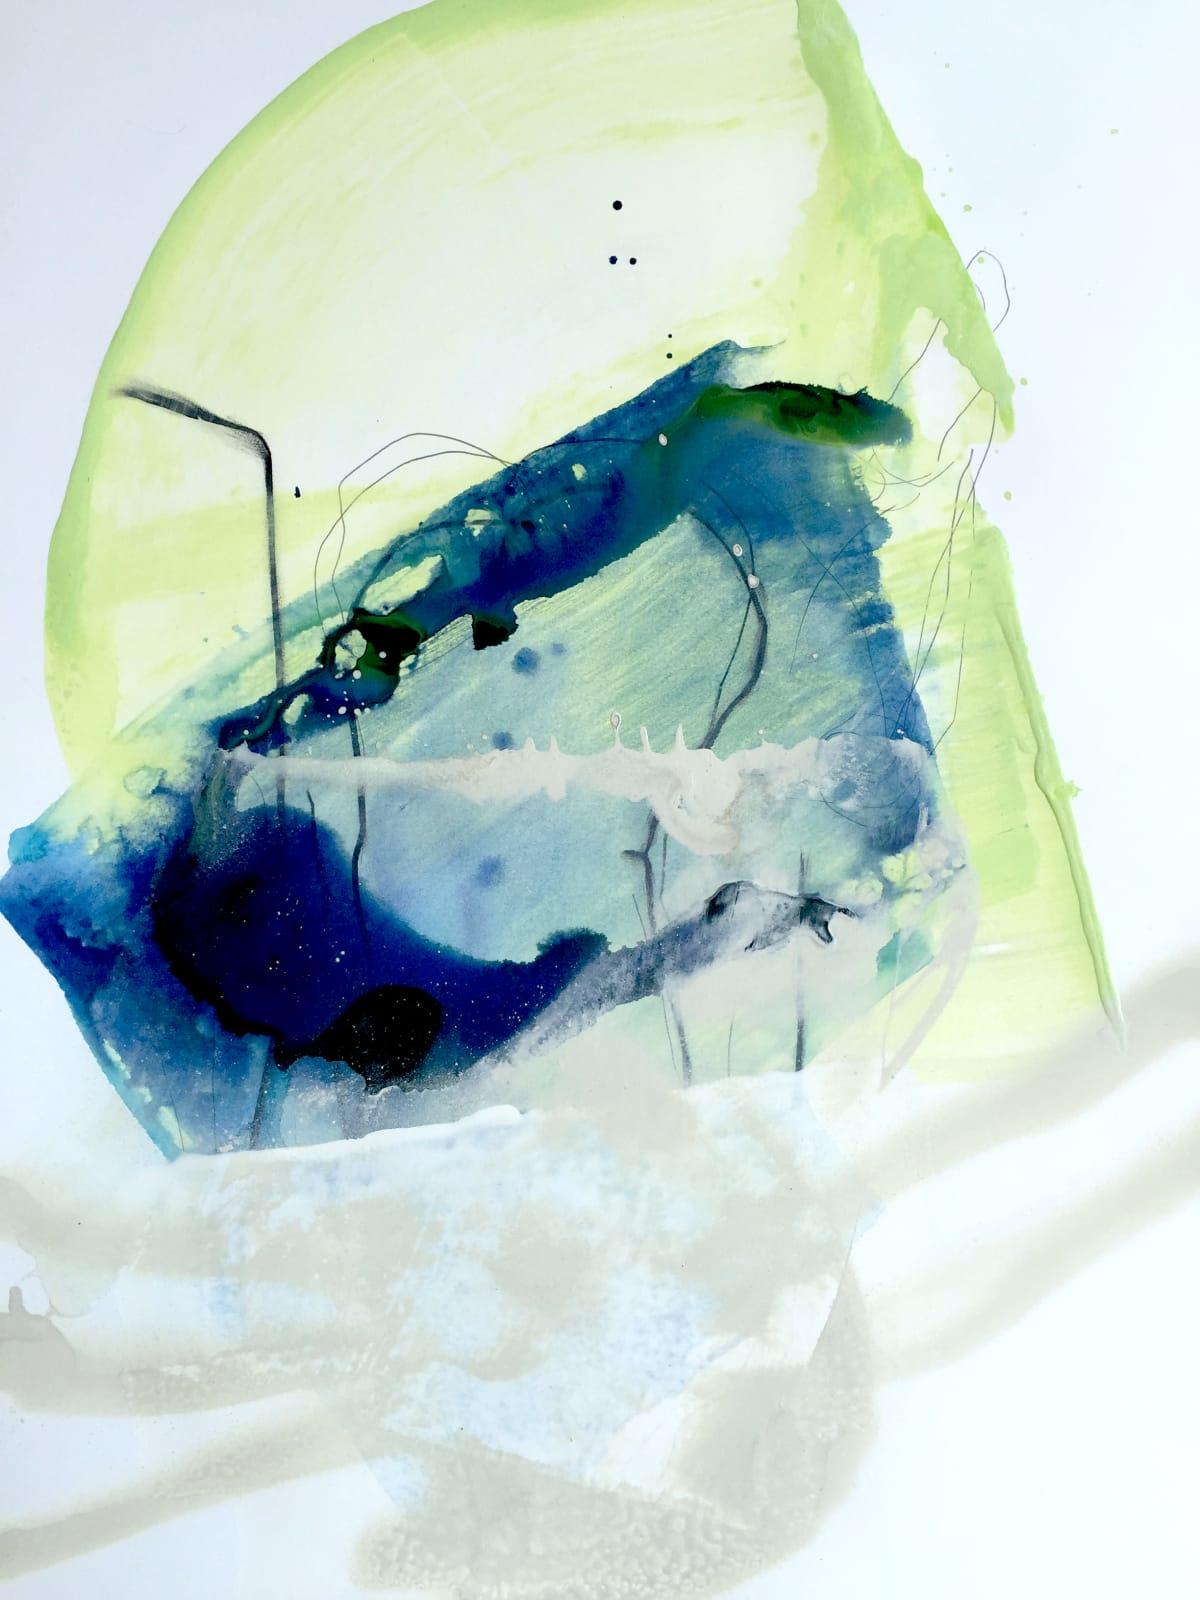 "Melissa Herrington Celestial Oceans of Aquas XII Mixed Media on Paper 18 x 24"" framed"